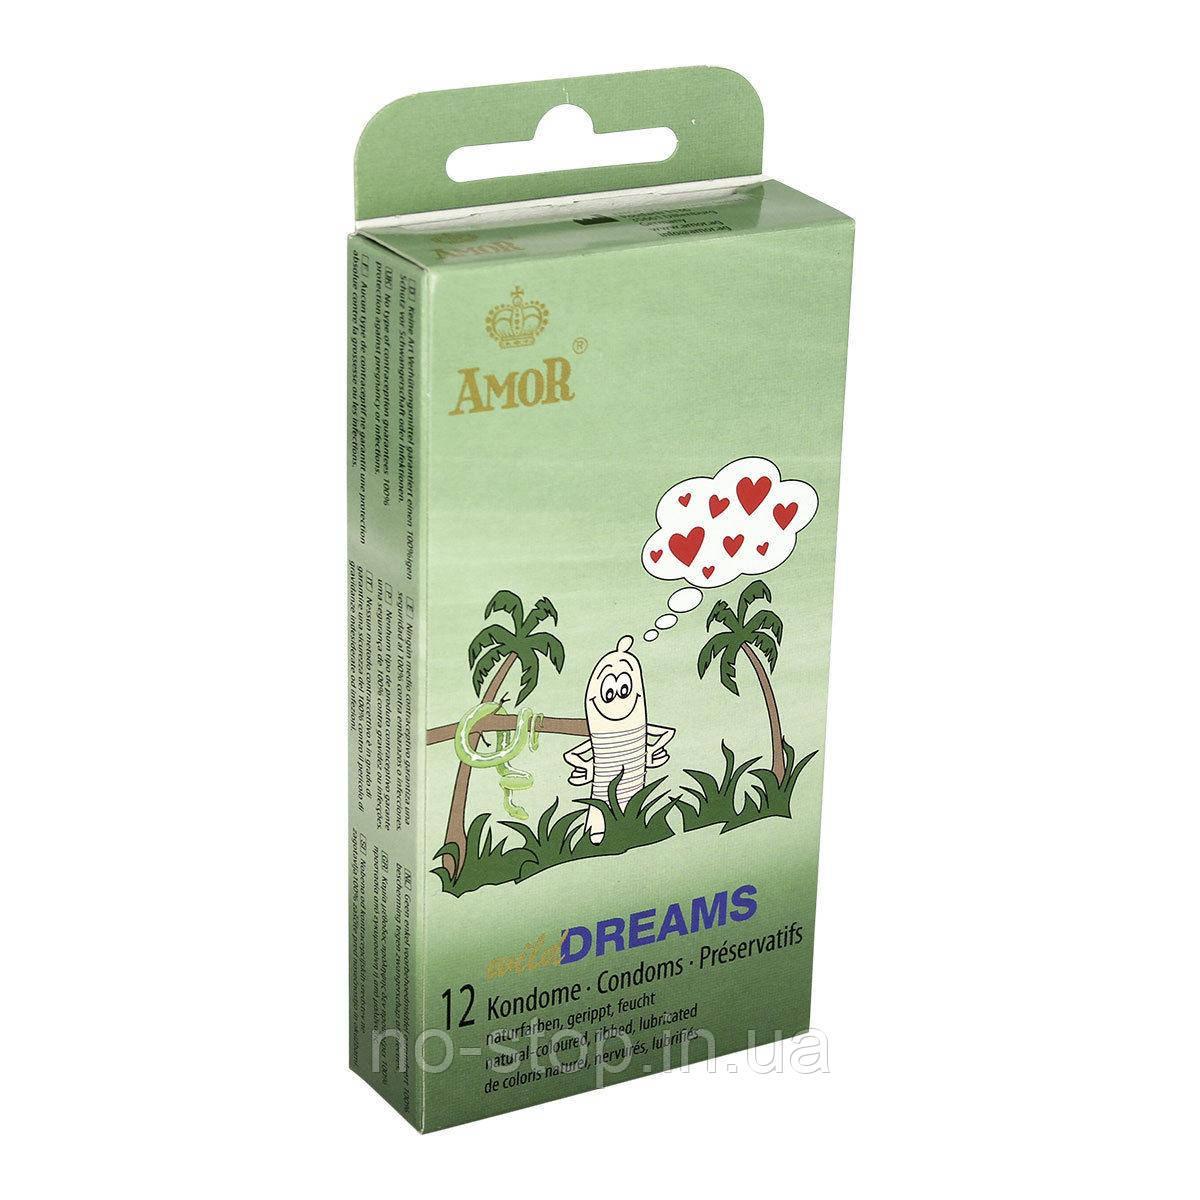 Презервативы - Amor wild Dreams 12шт